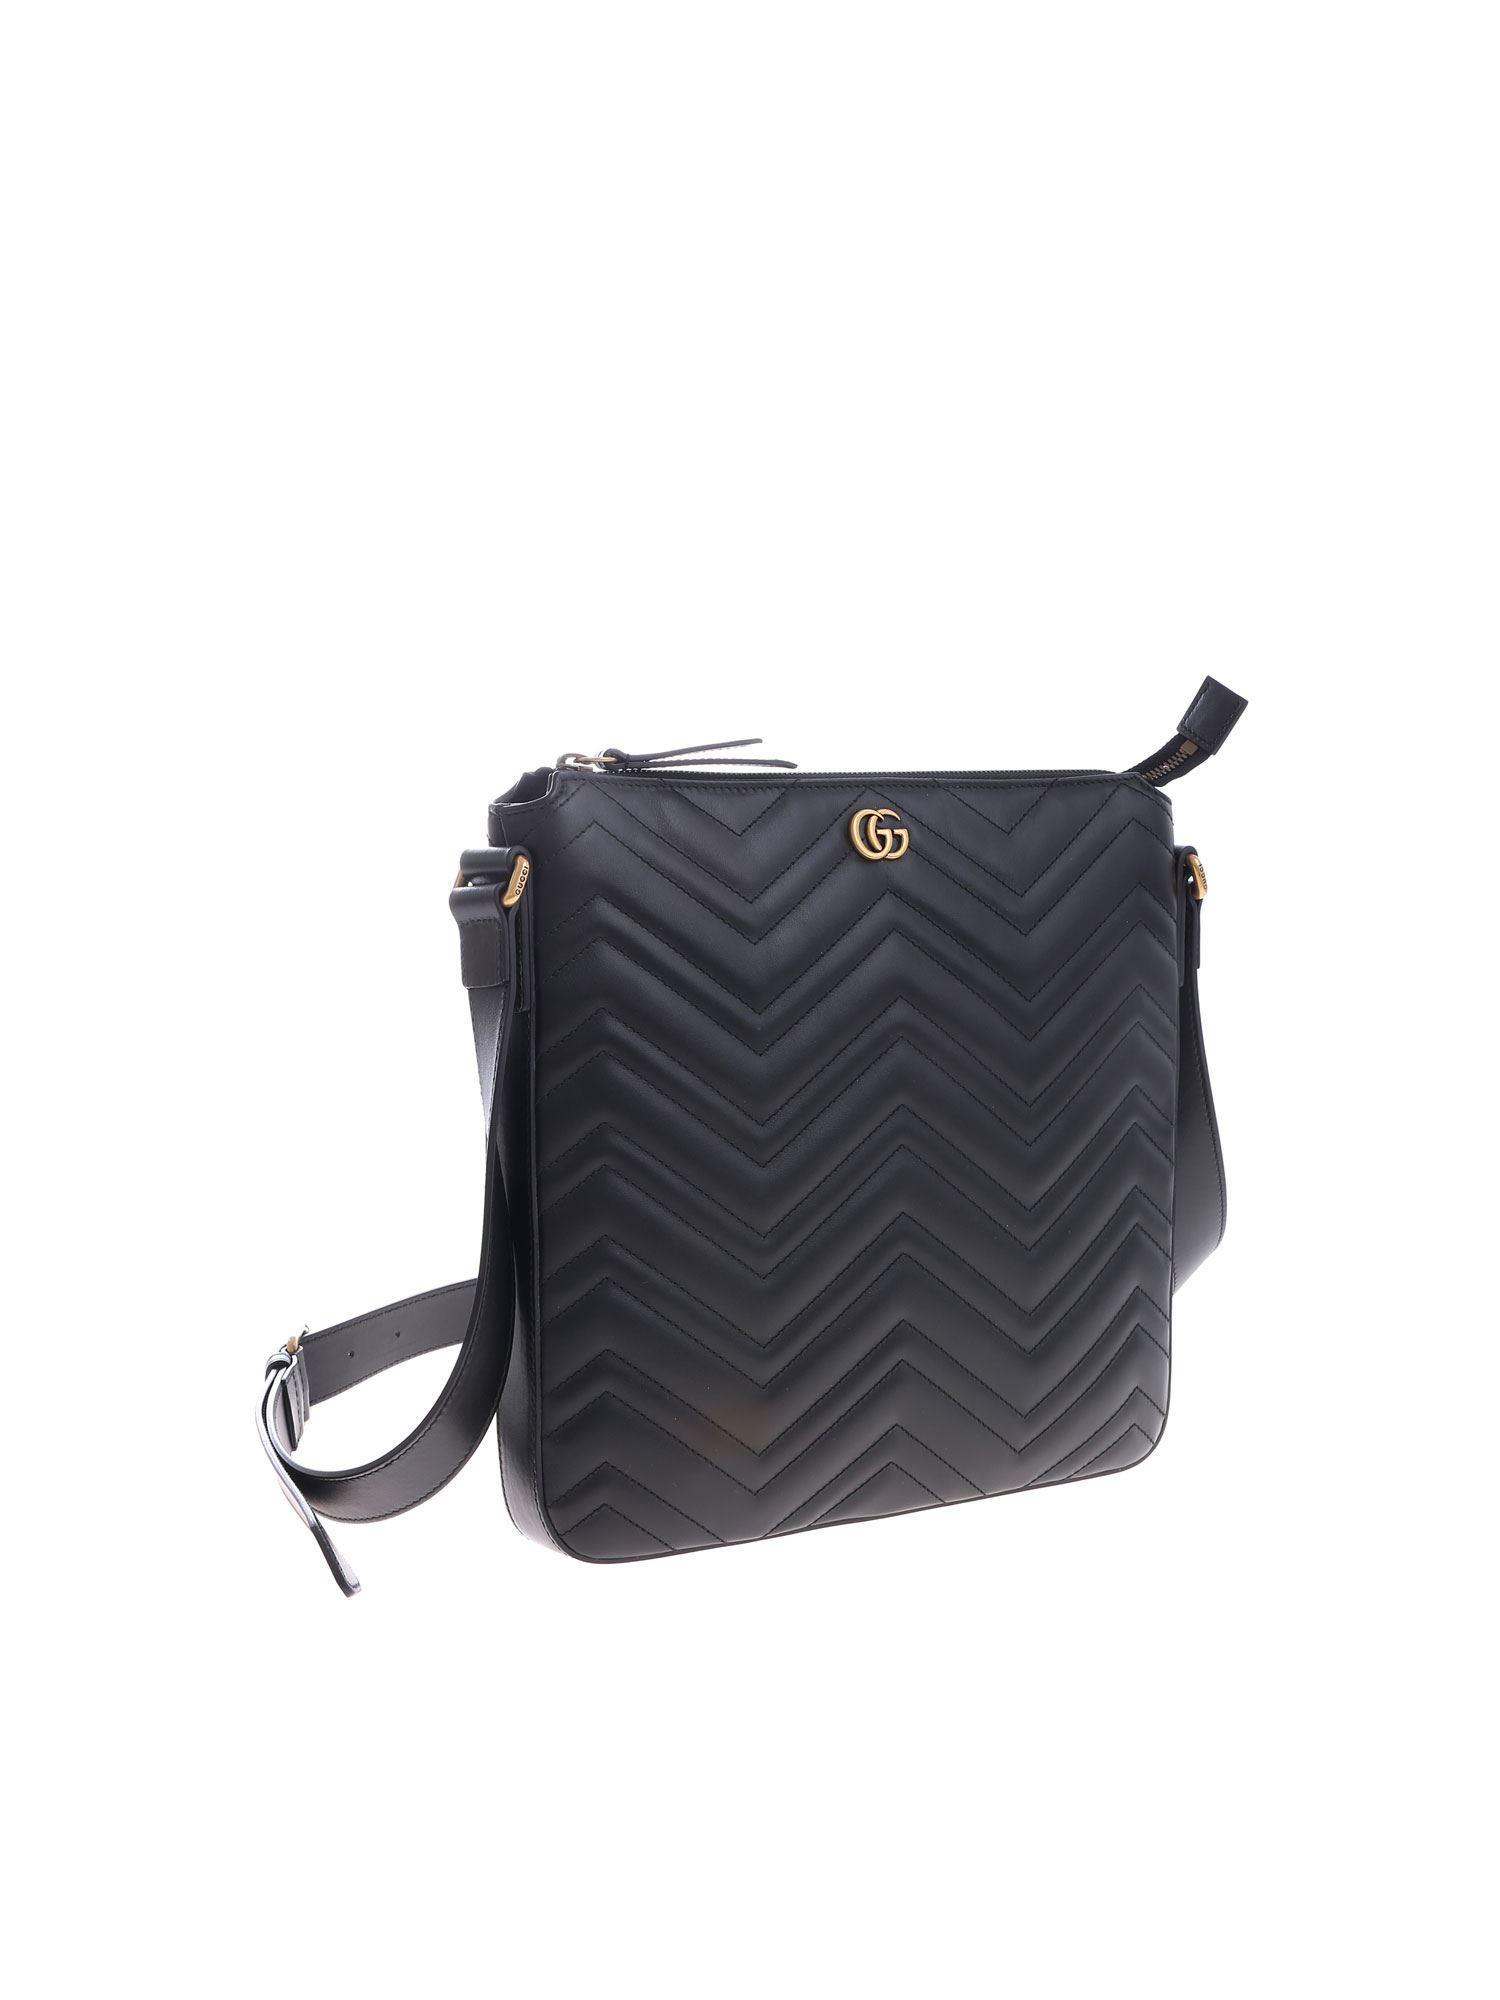 656d51e884c Gucci Messenger Marmont Crossbody Bag in Blue for Men - Lyst